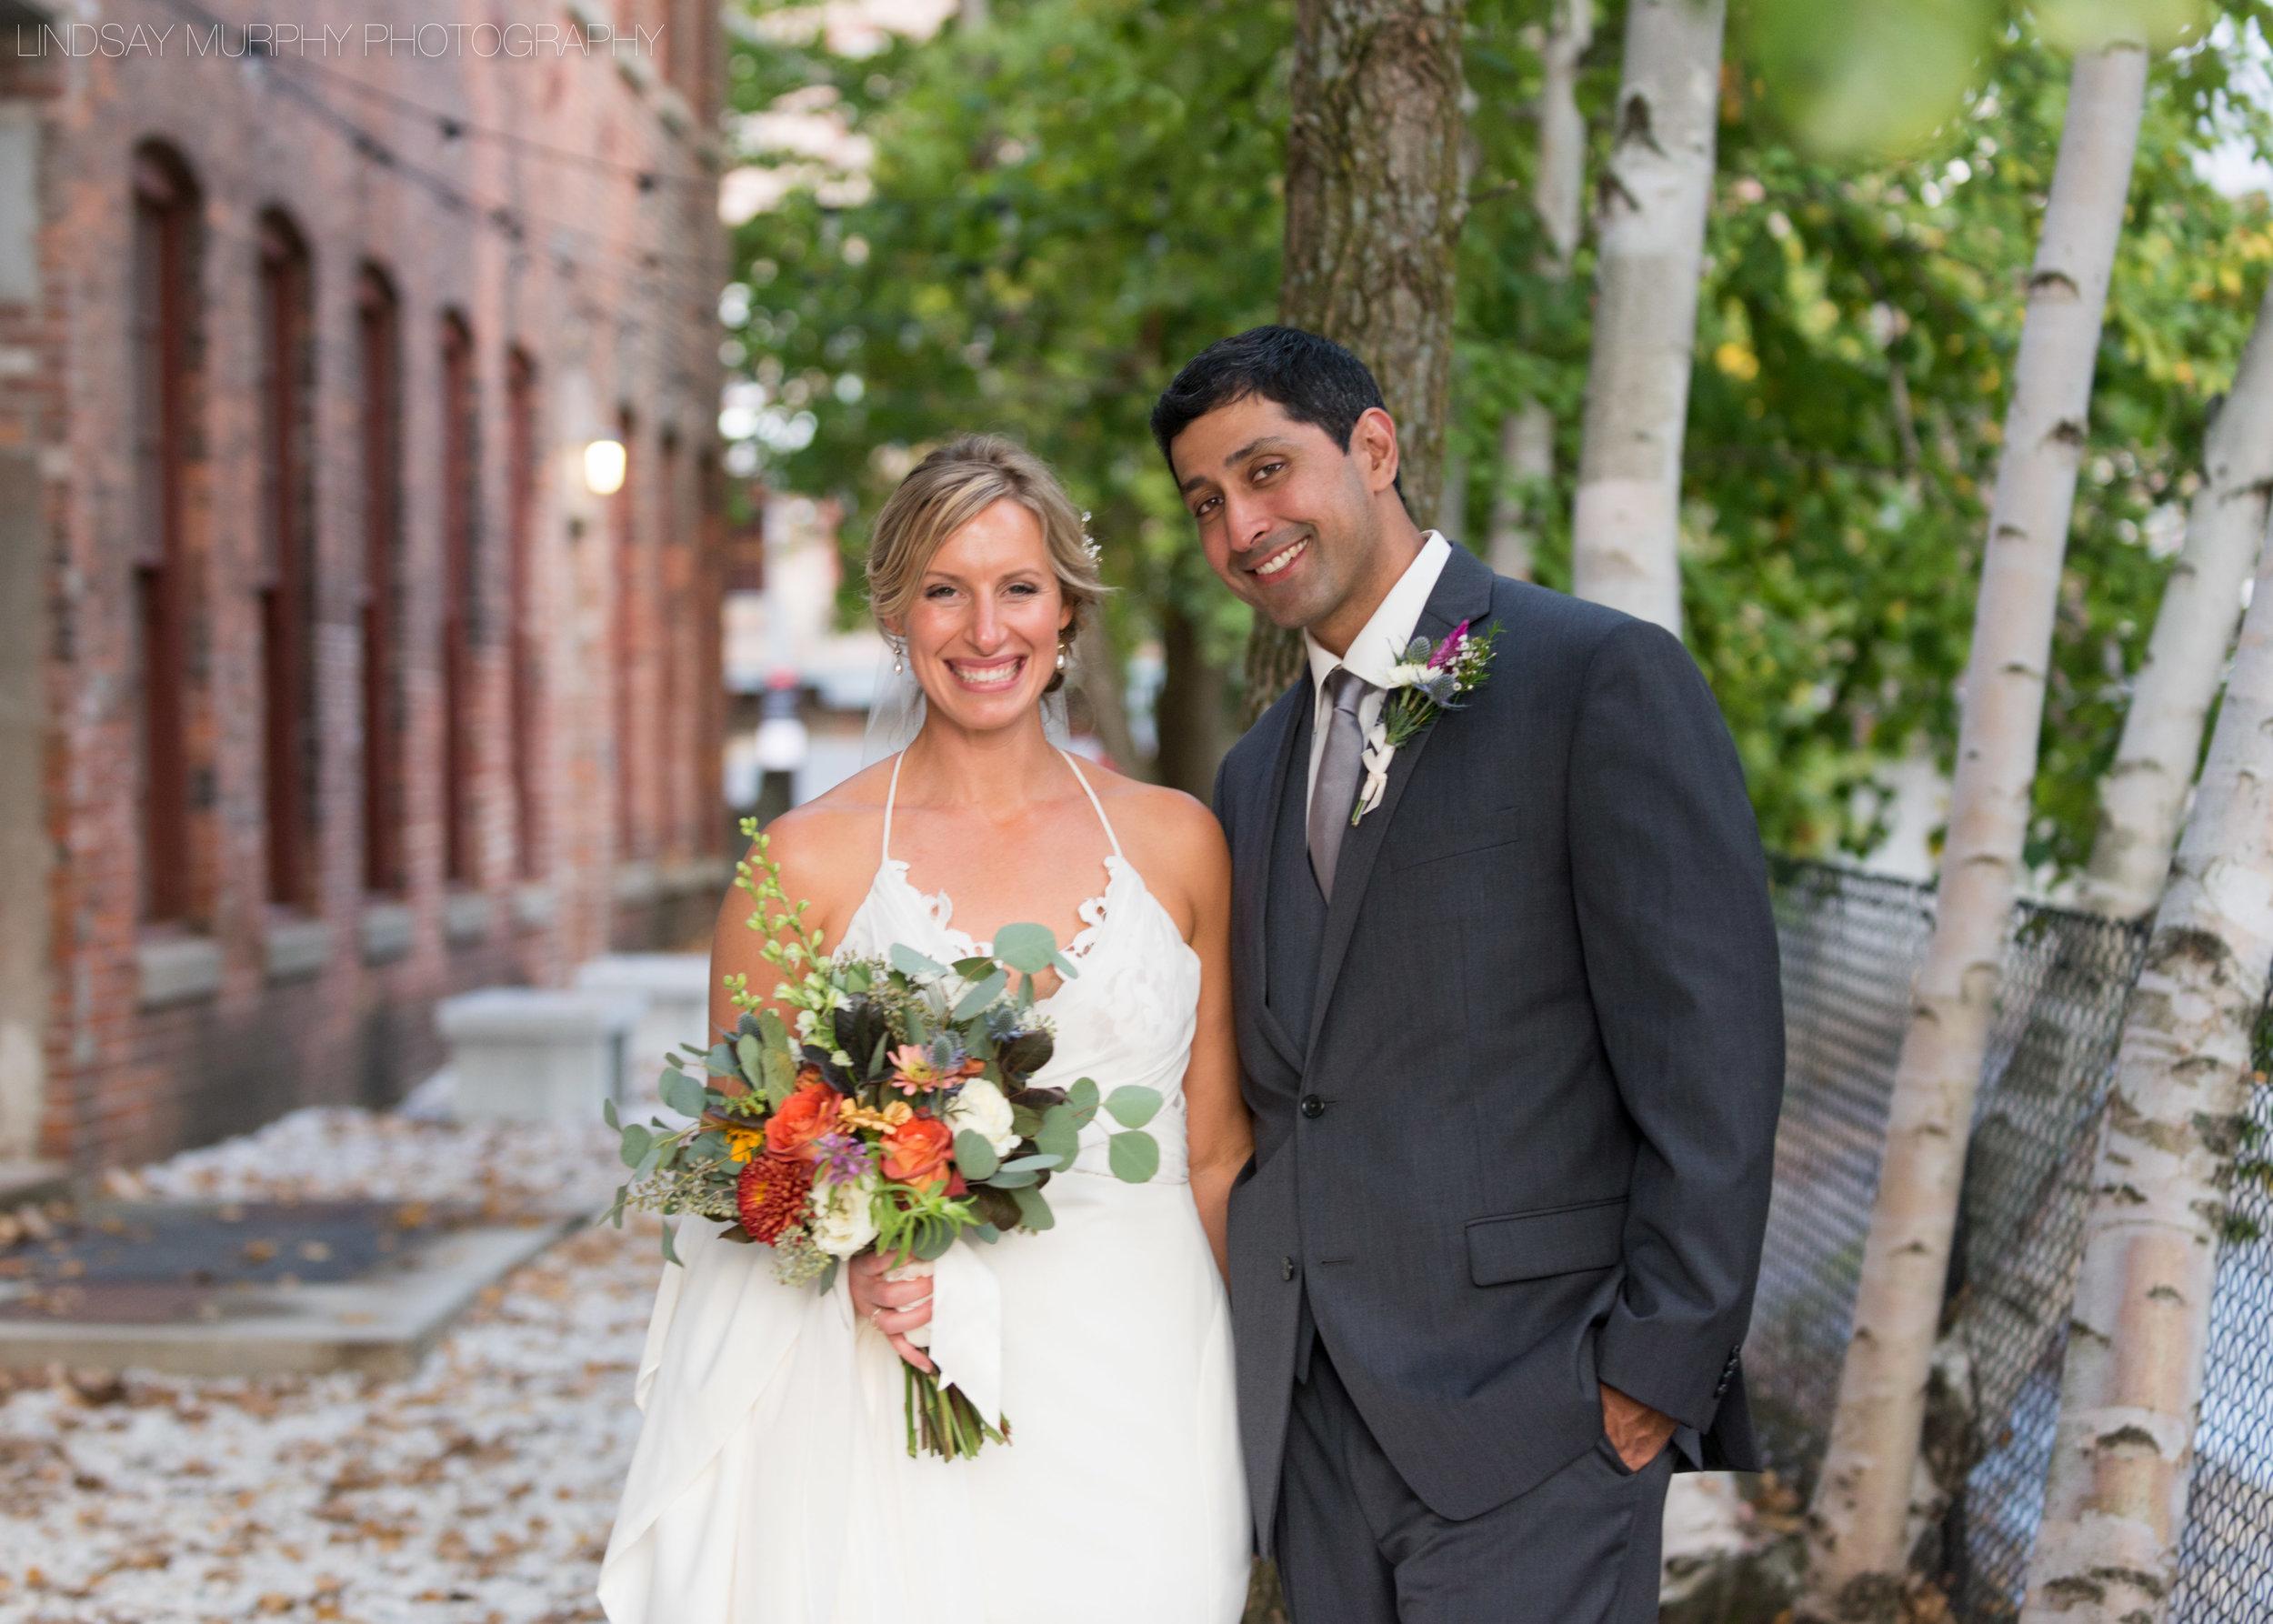 New_England_wedding-46.jpg